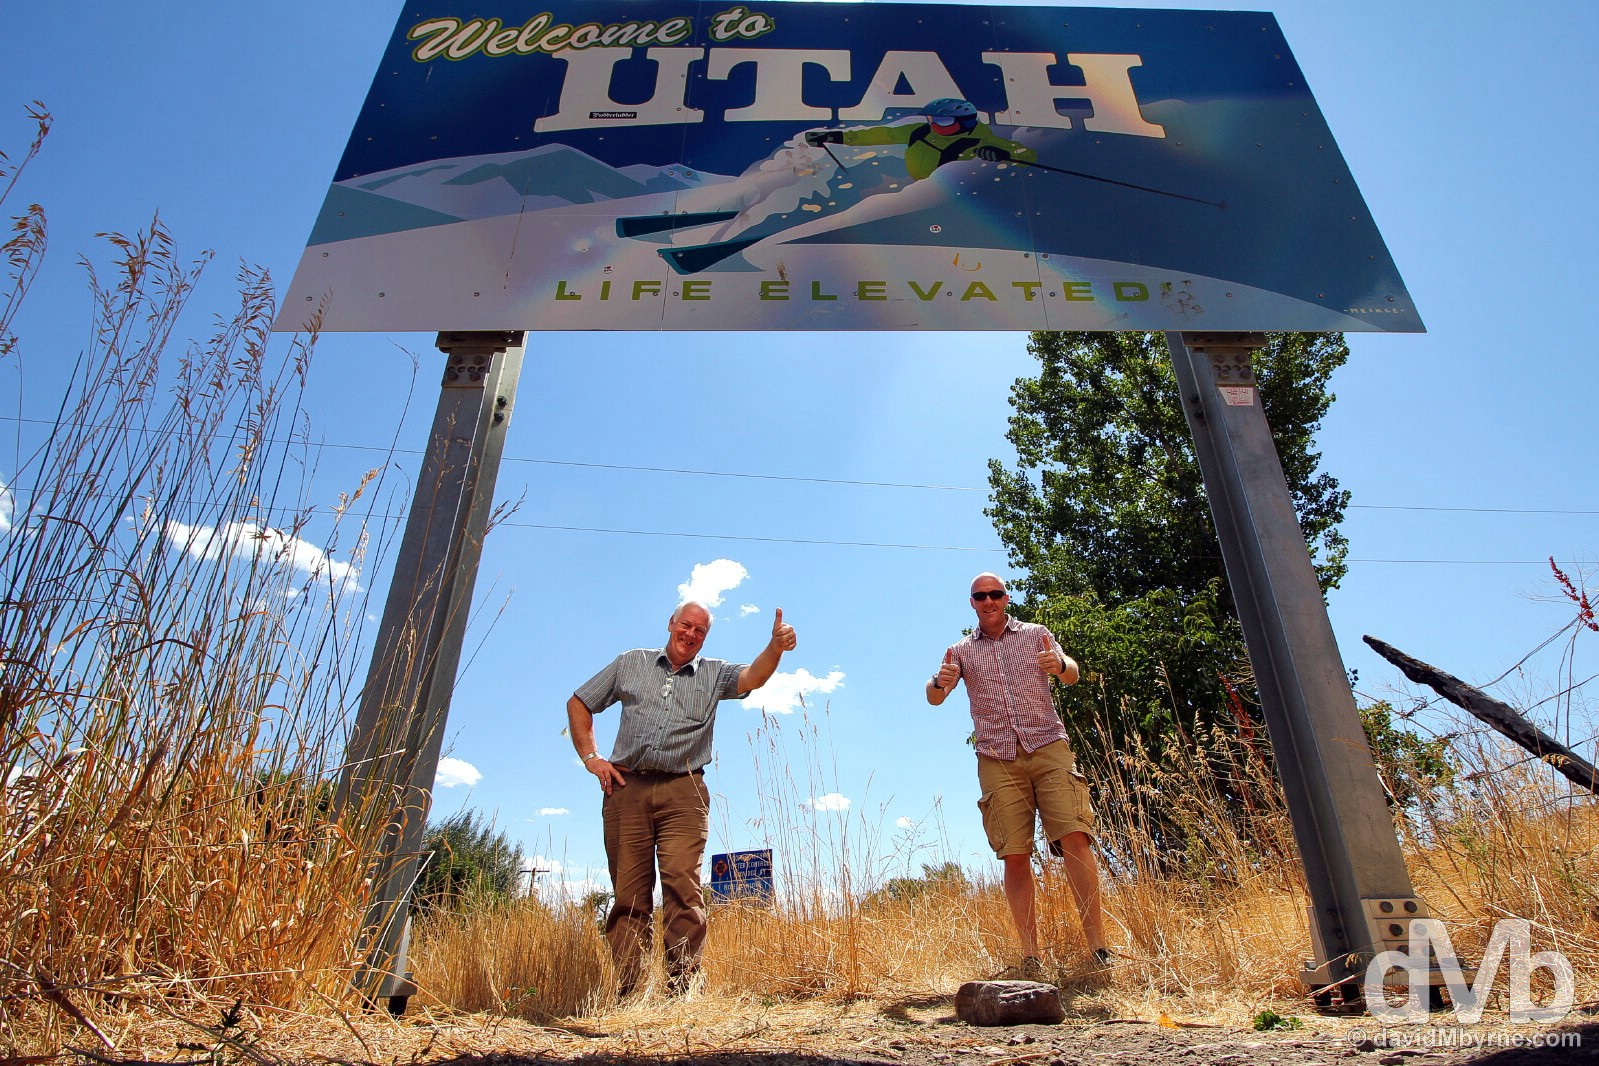 At the Idaho - Utah state line on U.S. Highway 89. September 6, 2016.